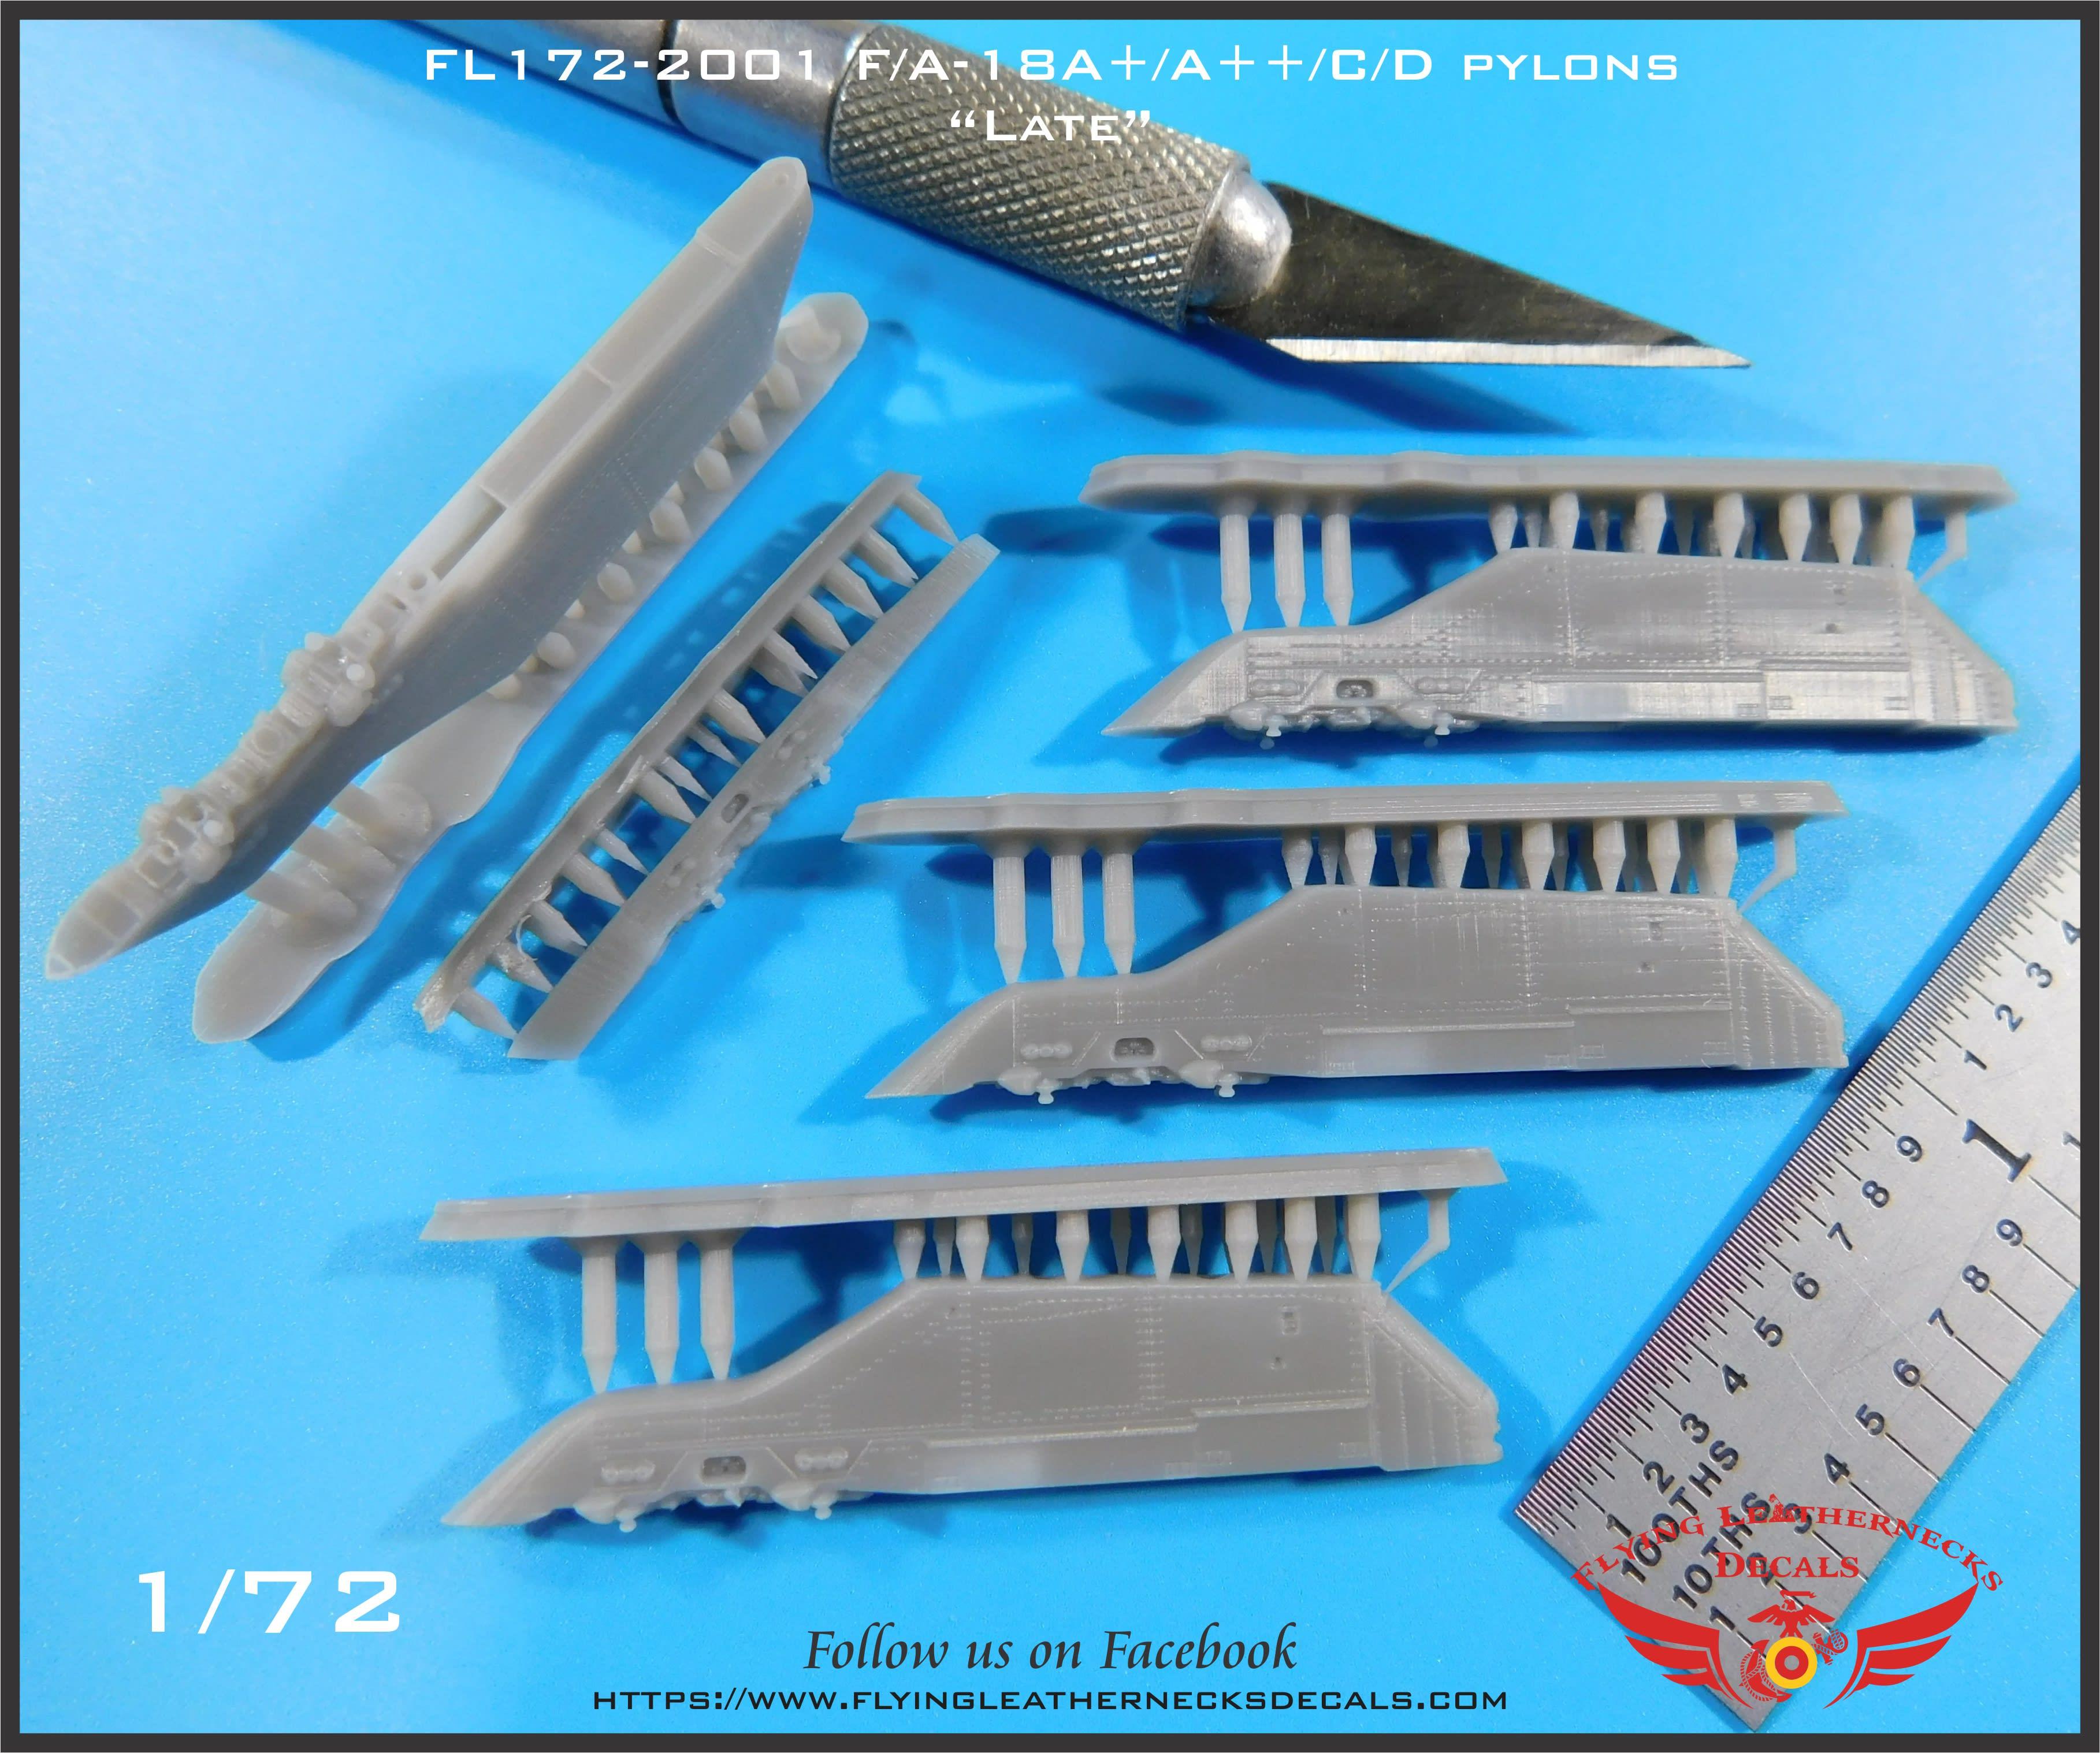 FL172-2001